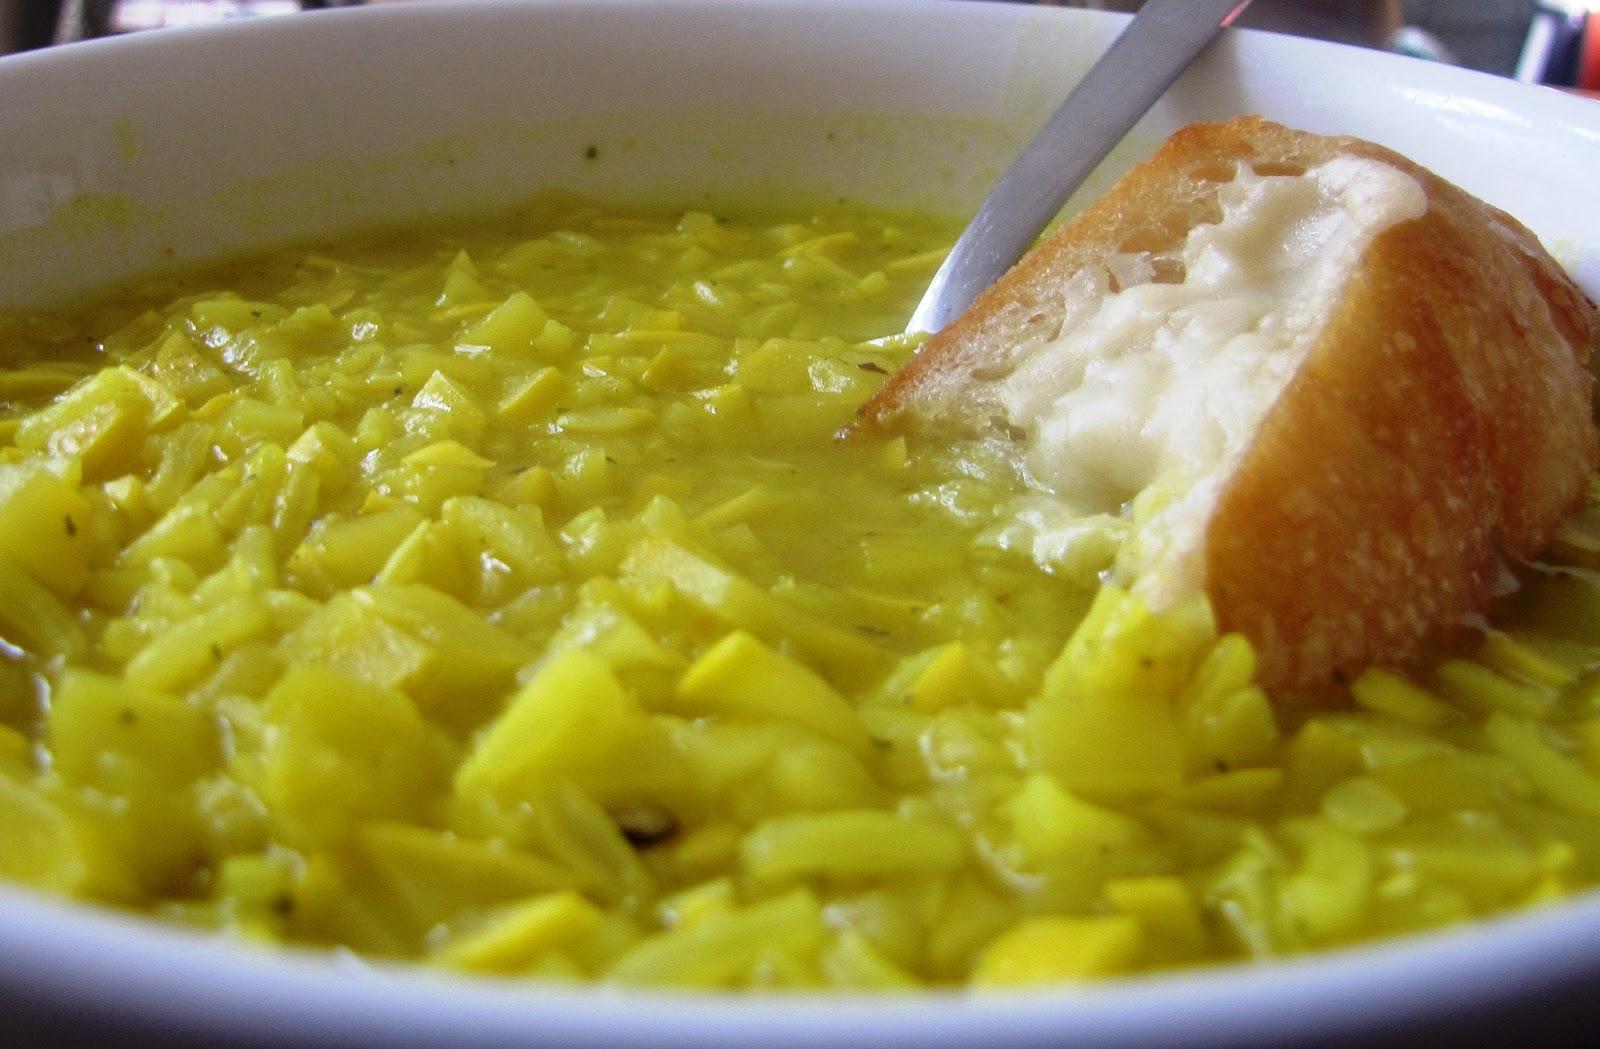 SoupruaryLemony Yellow Squash and Rice Soup